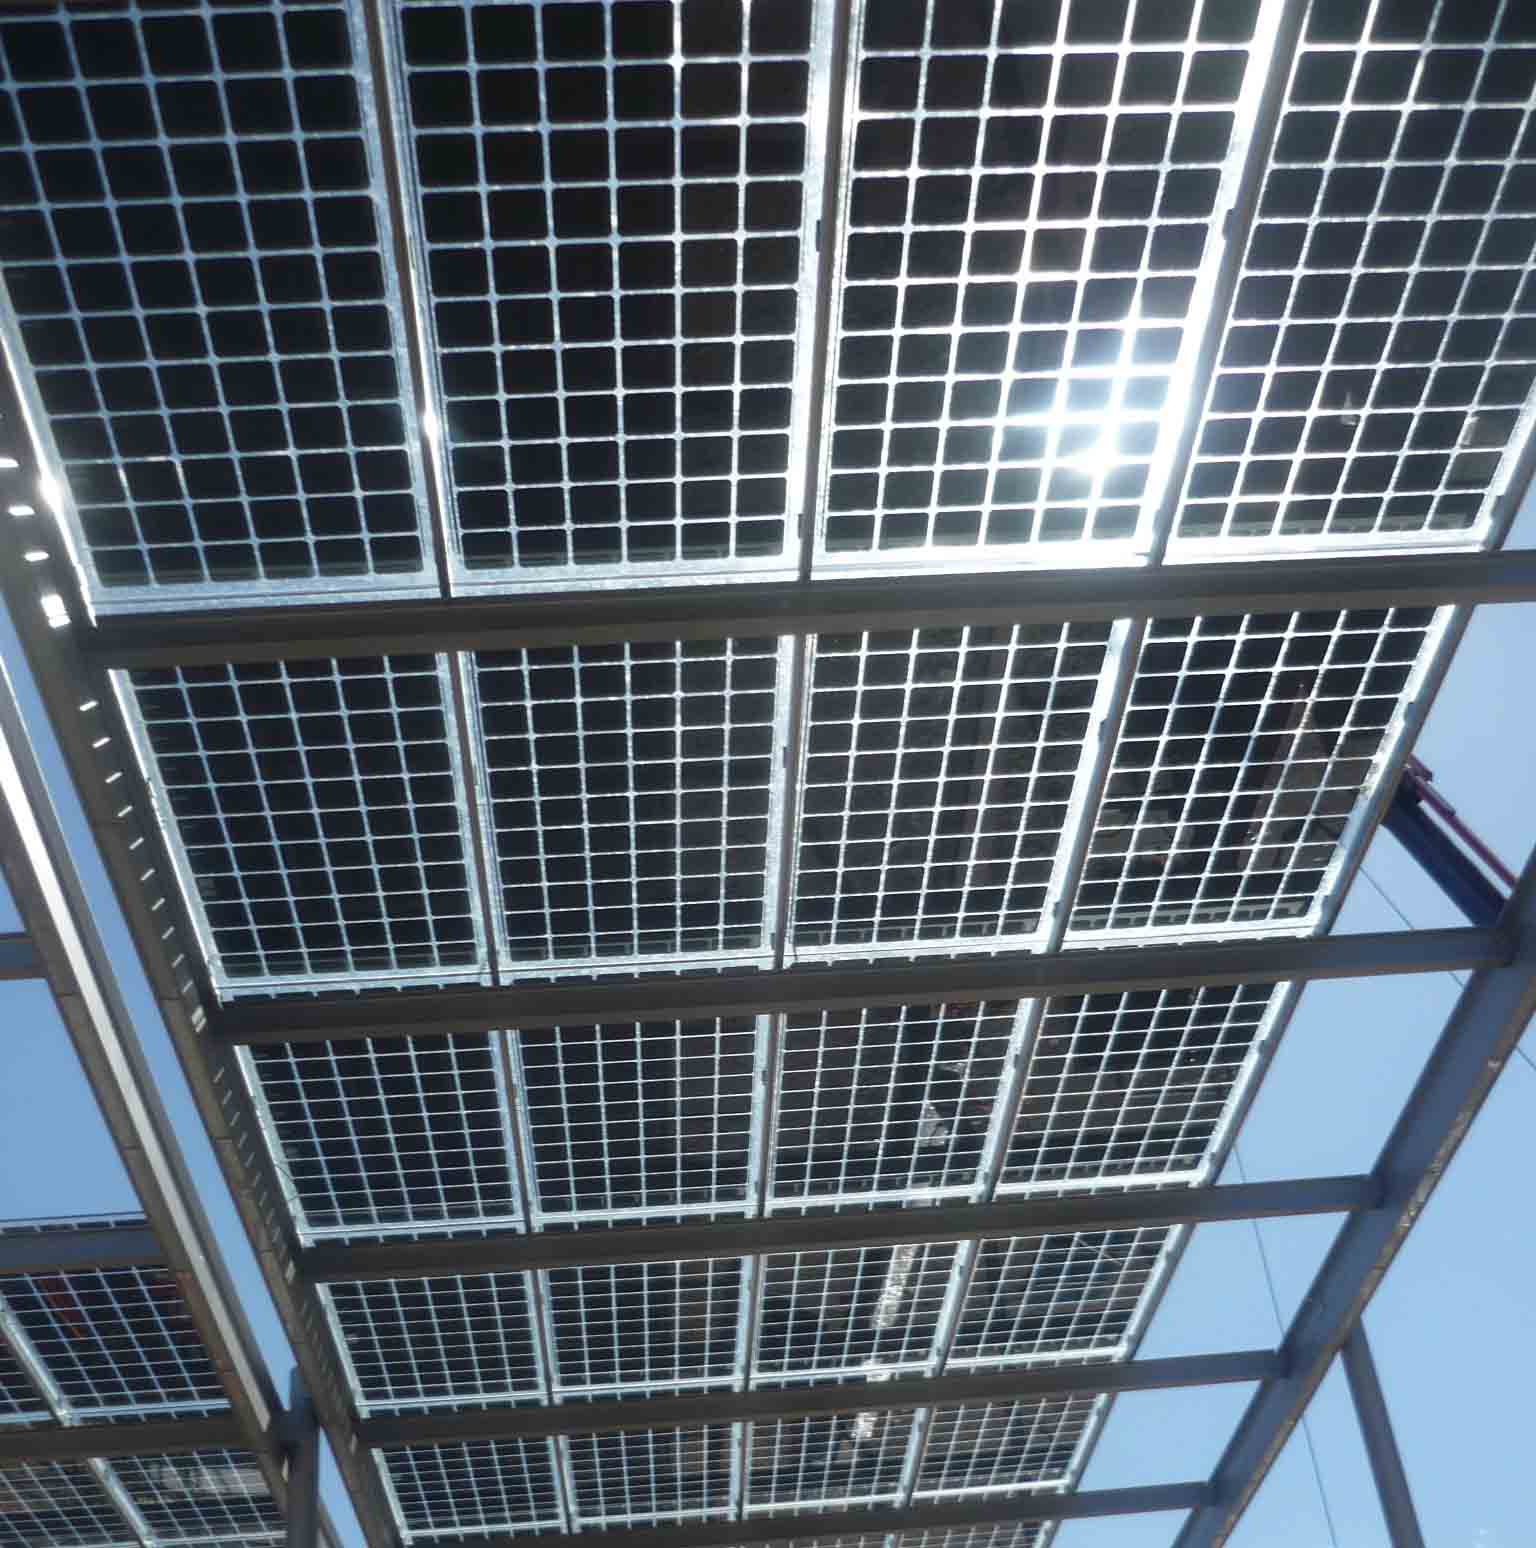 barcelona installiert photovoltaik pergolas mit vidursolar. Black Bedroom Furniture Sets. Home Design Ideas